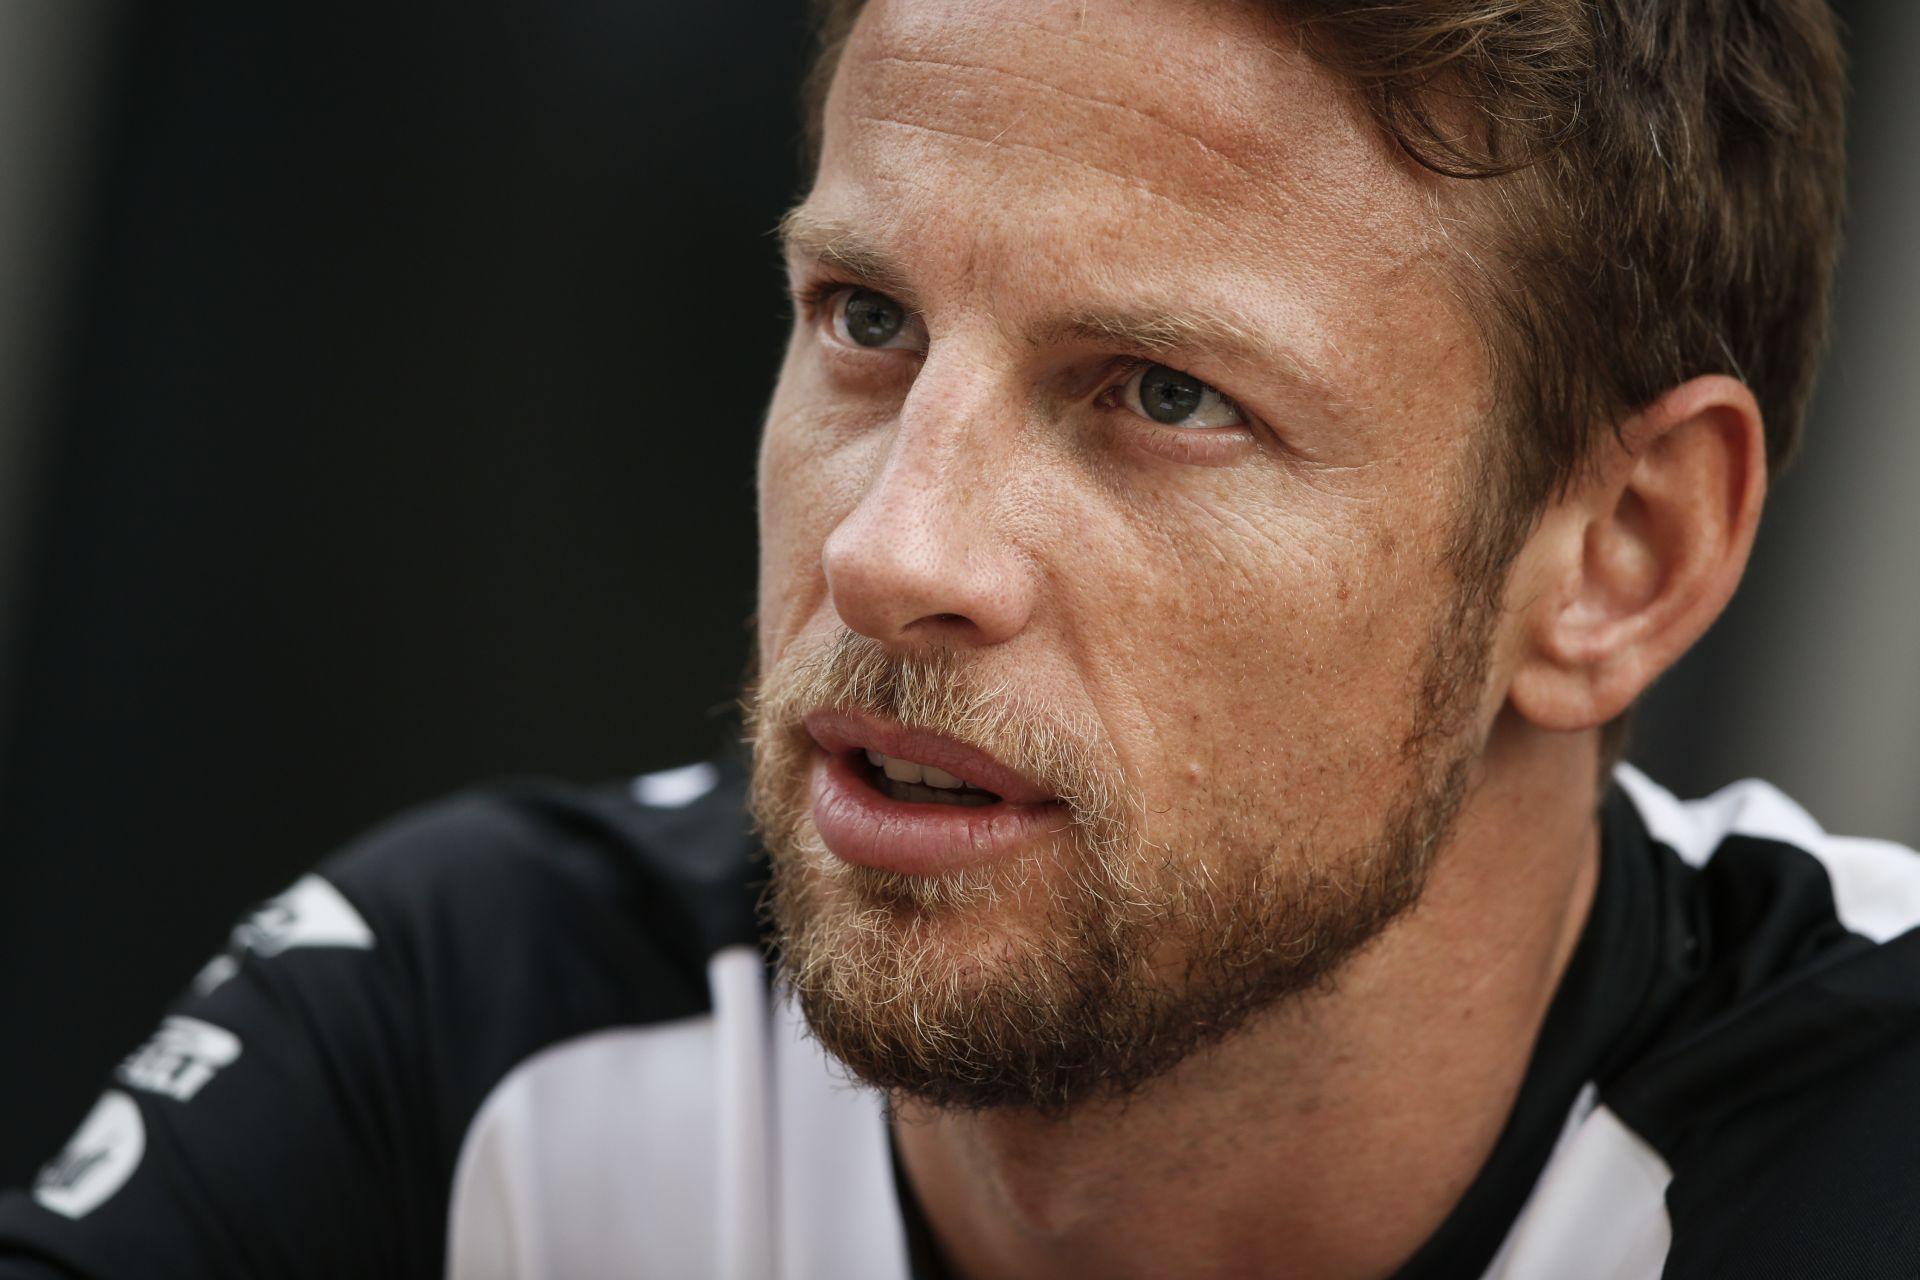 Jenson Button versenycipője nagyon állat!